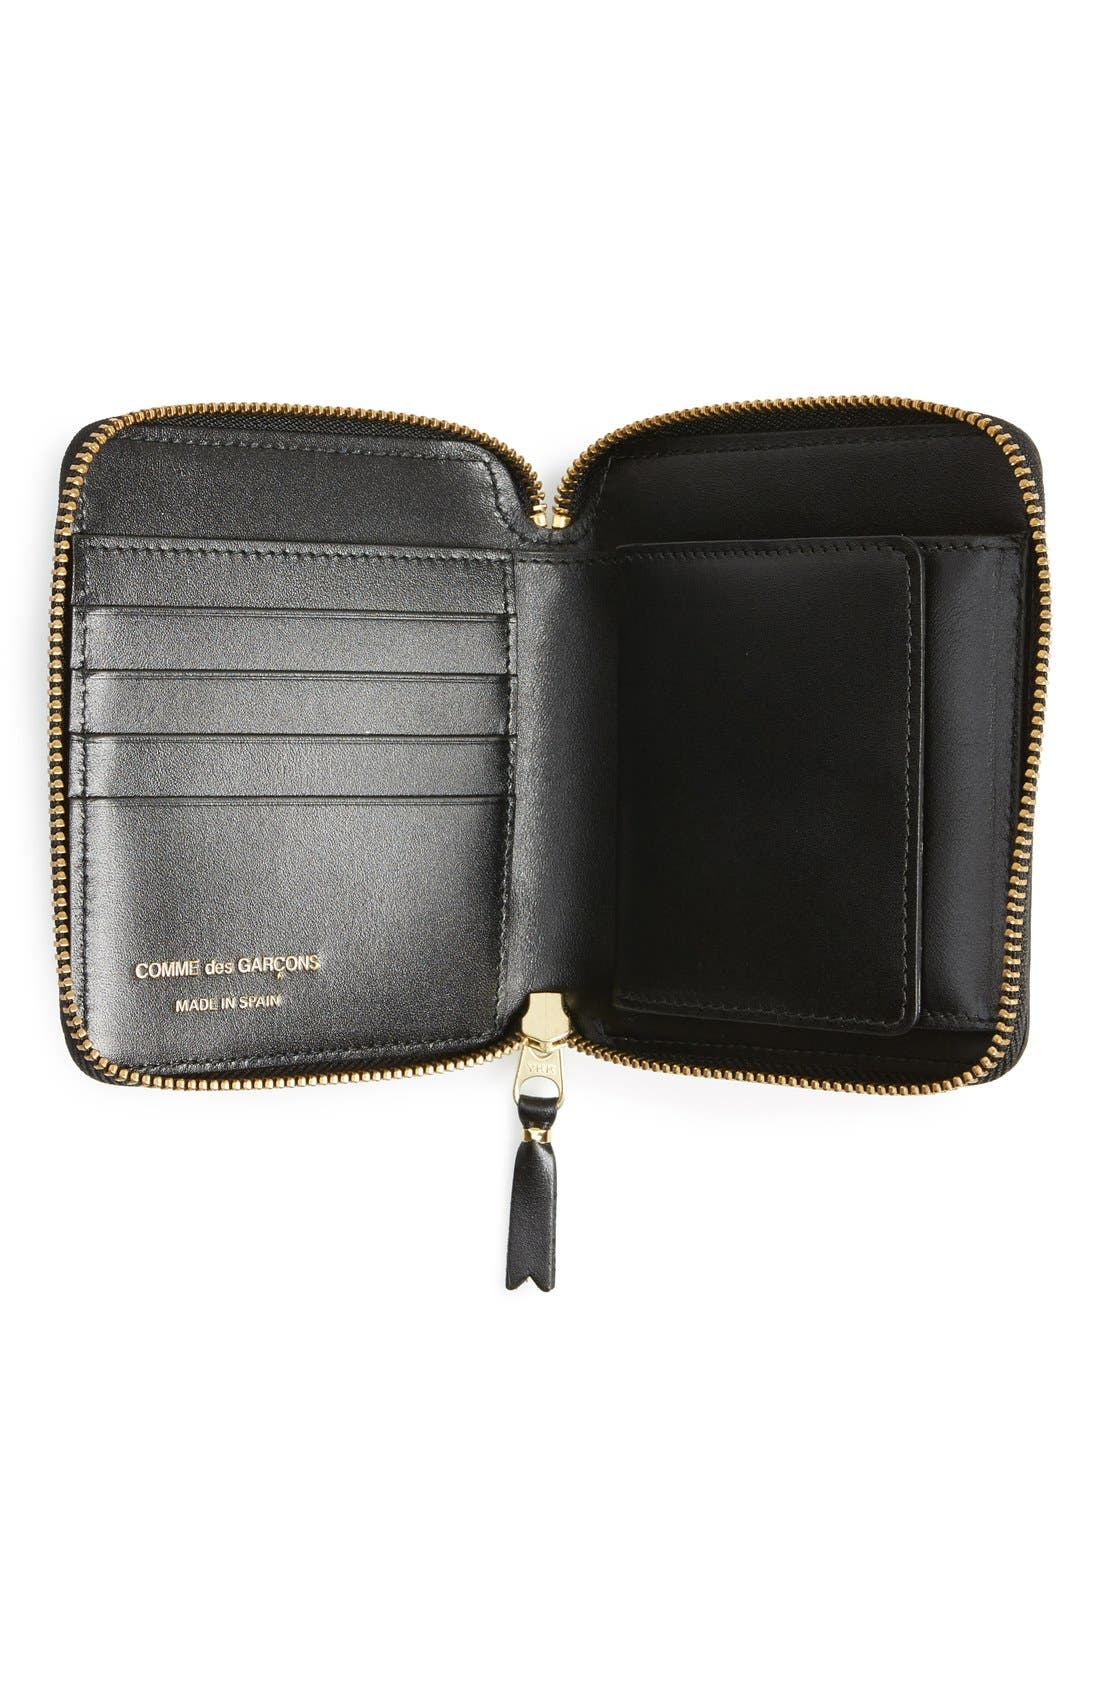 Comme de Garçons Embossed French Wallet,                             Alternate thumbnail 3, color,                             Black